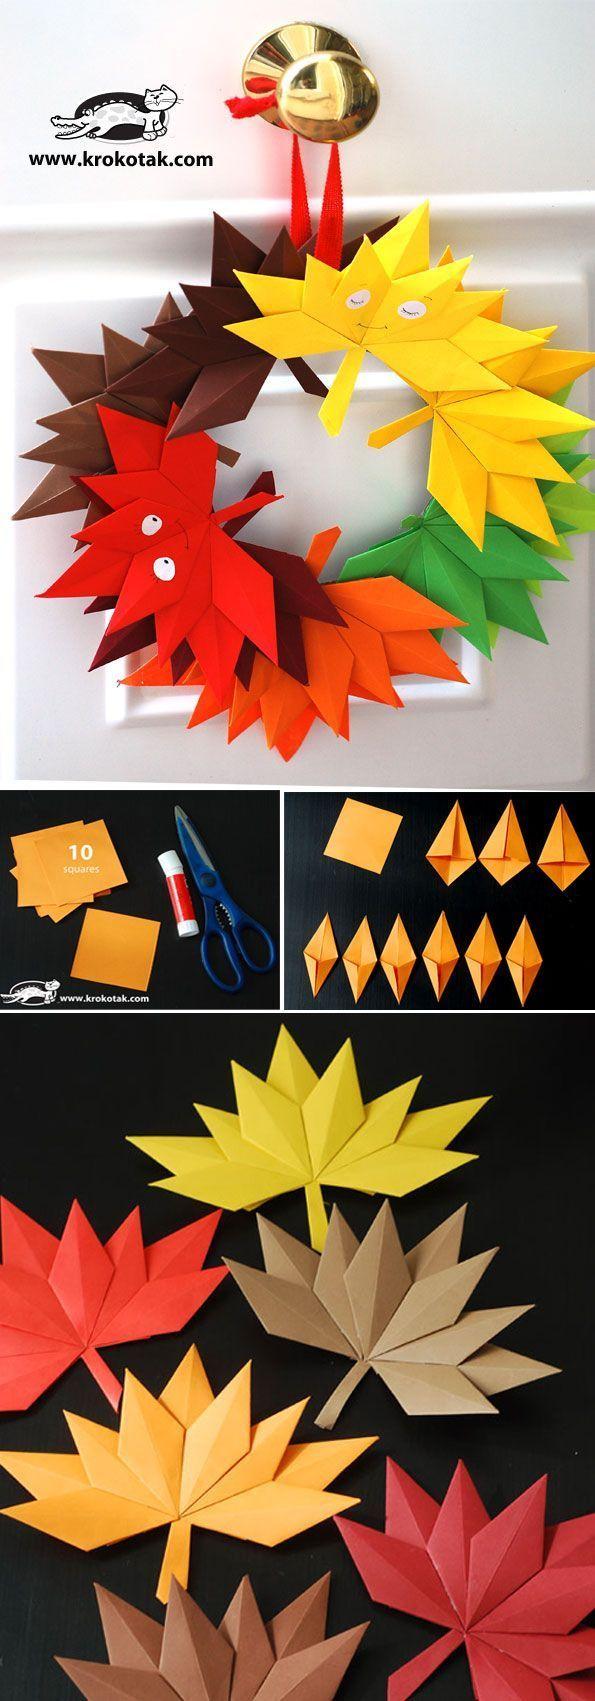 Legende  Papierblätter gefaltet is creative inspiration for us. Get more photo about hom